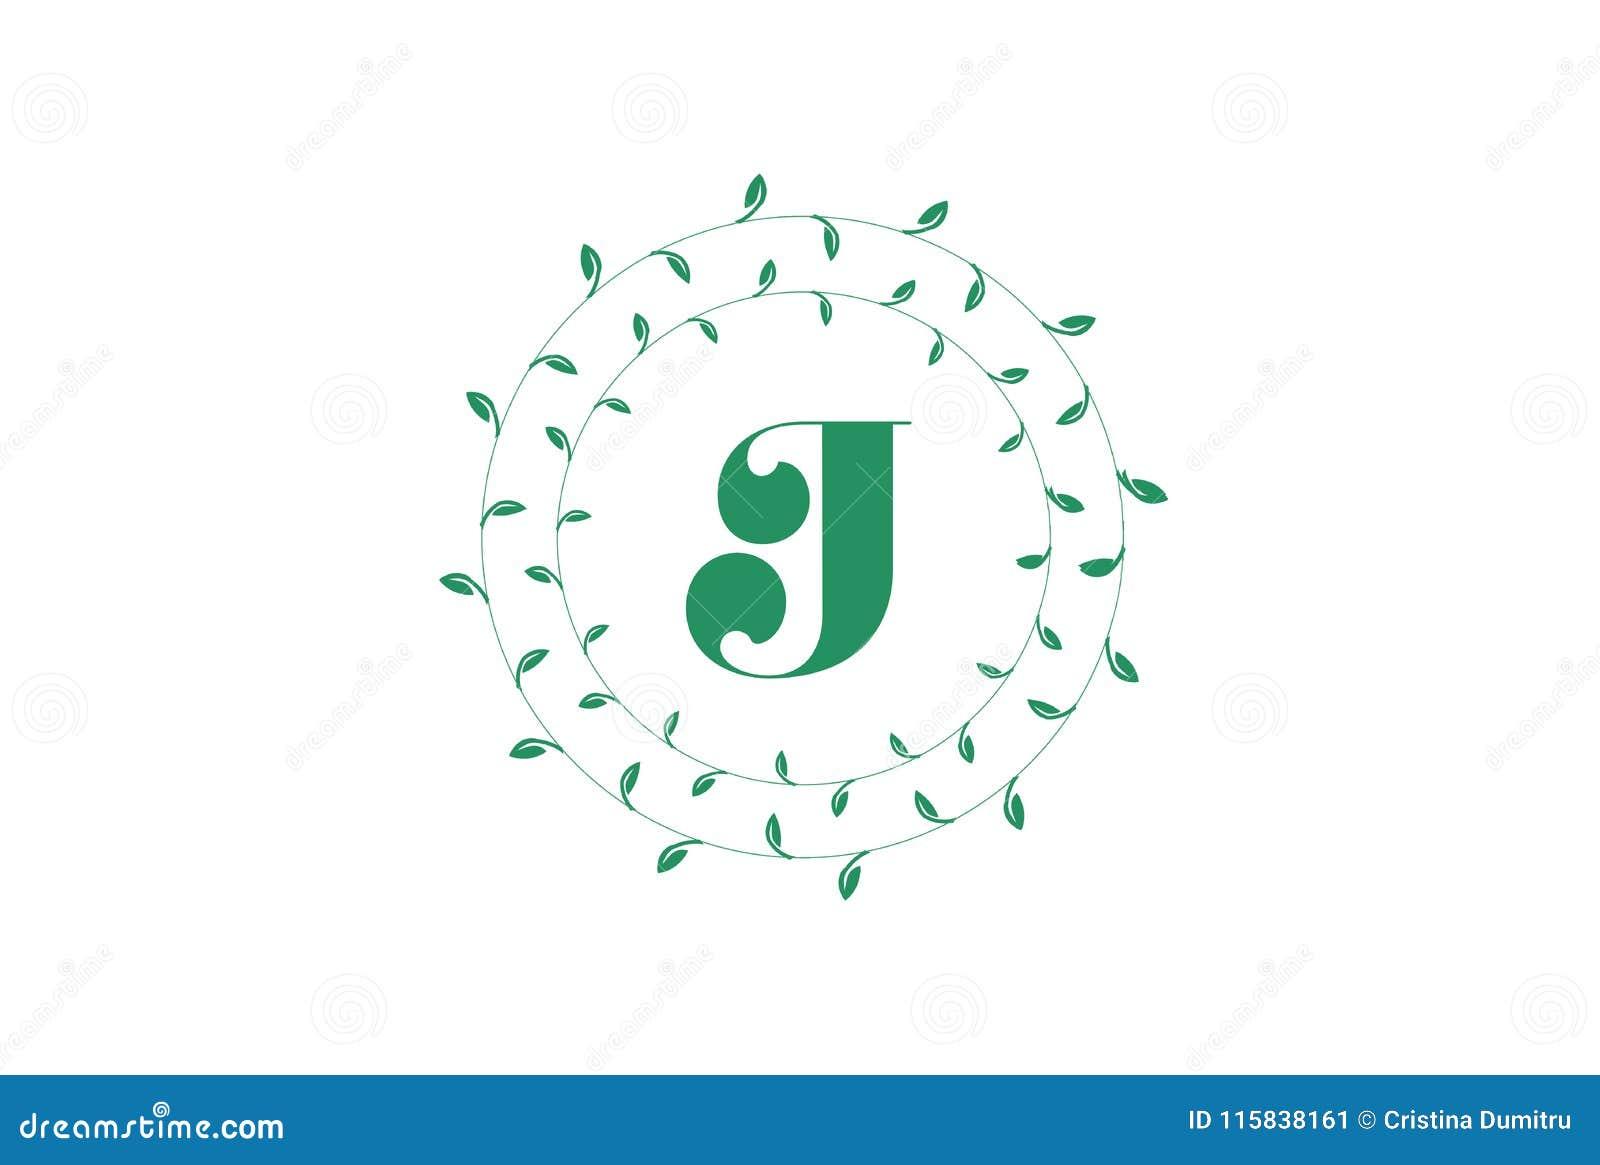 letter j logo with round green leaves elegant floral monogram